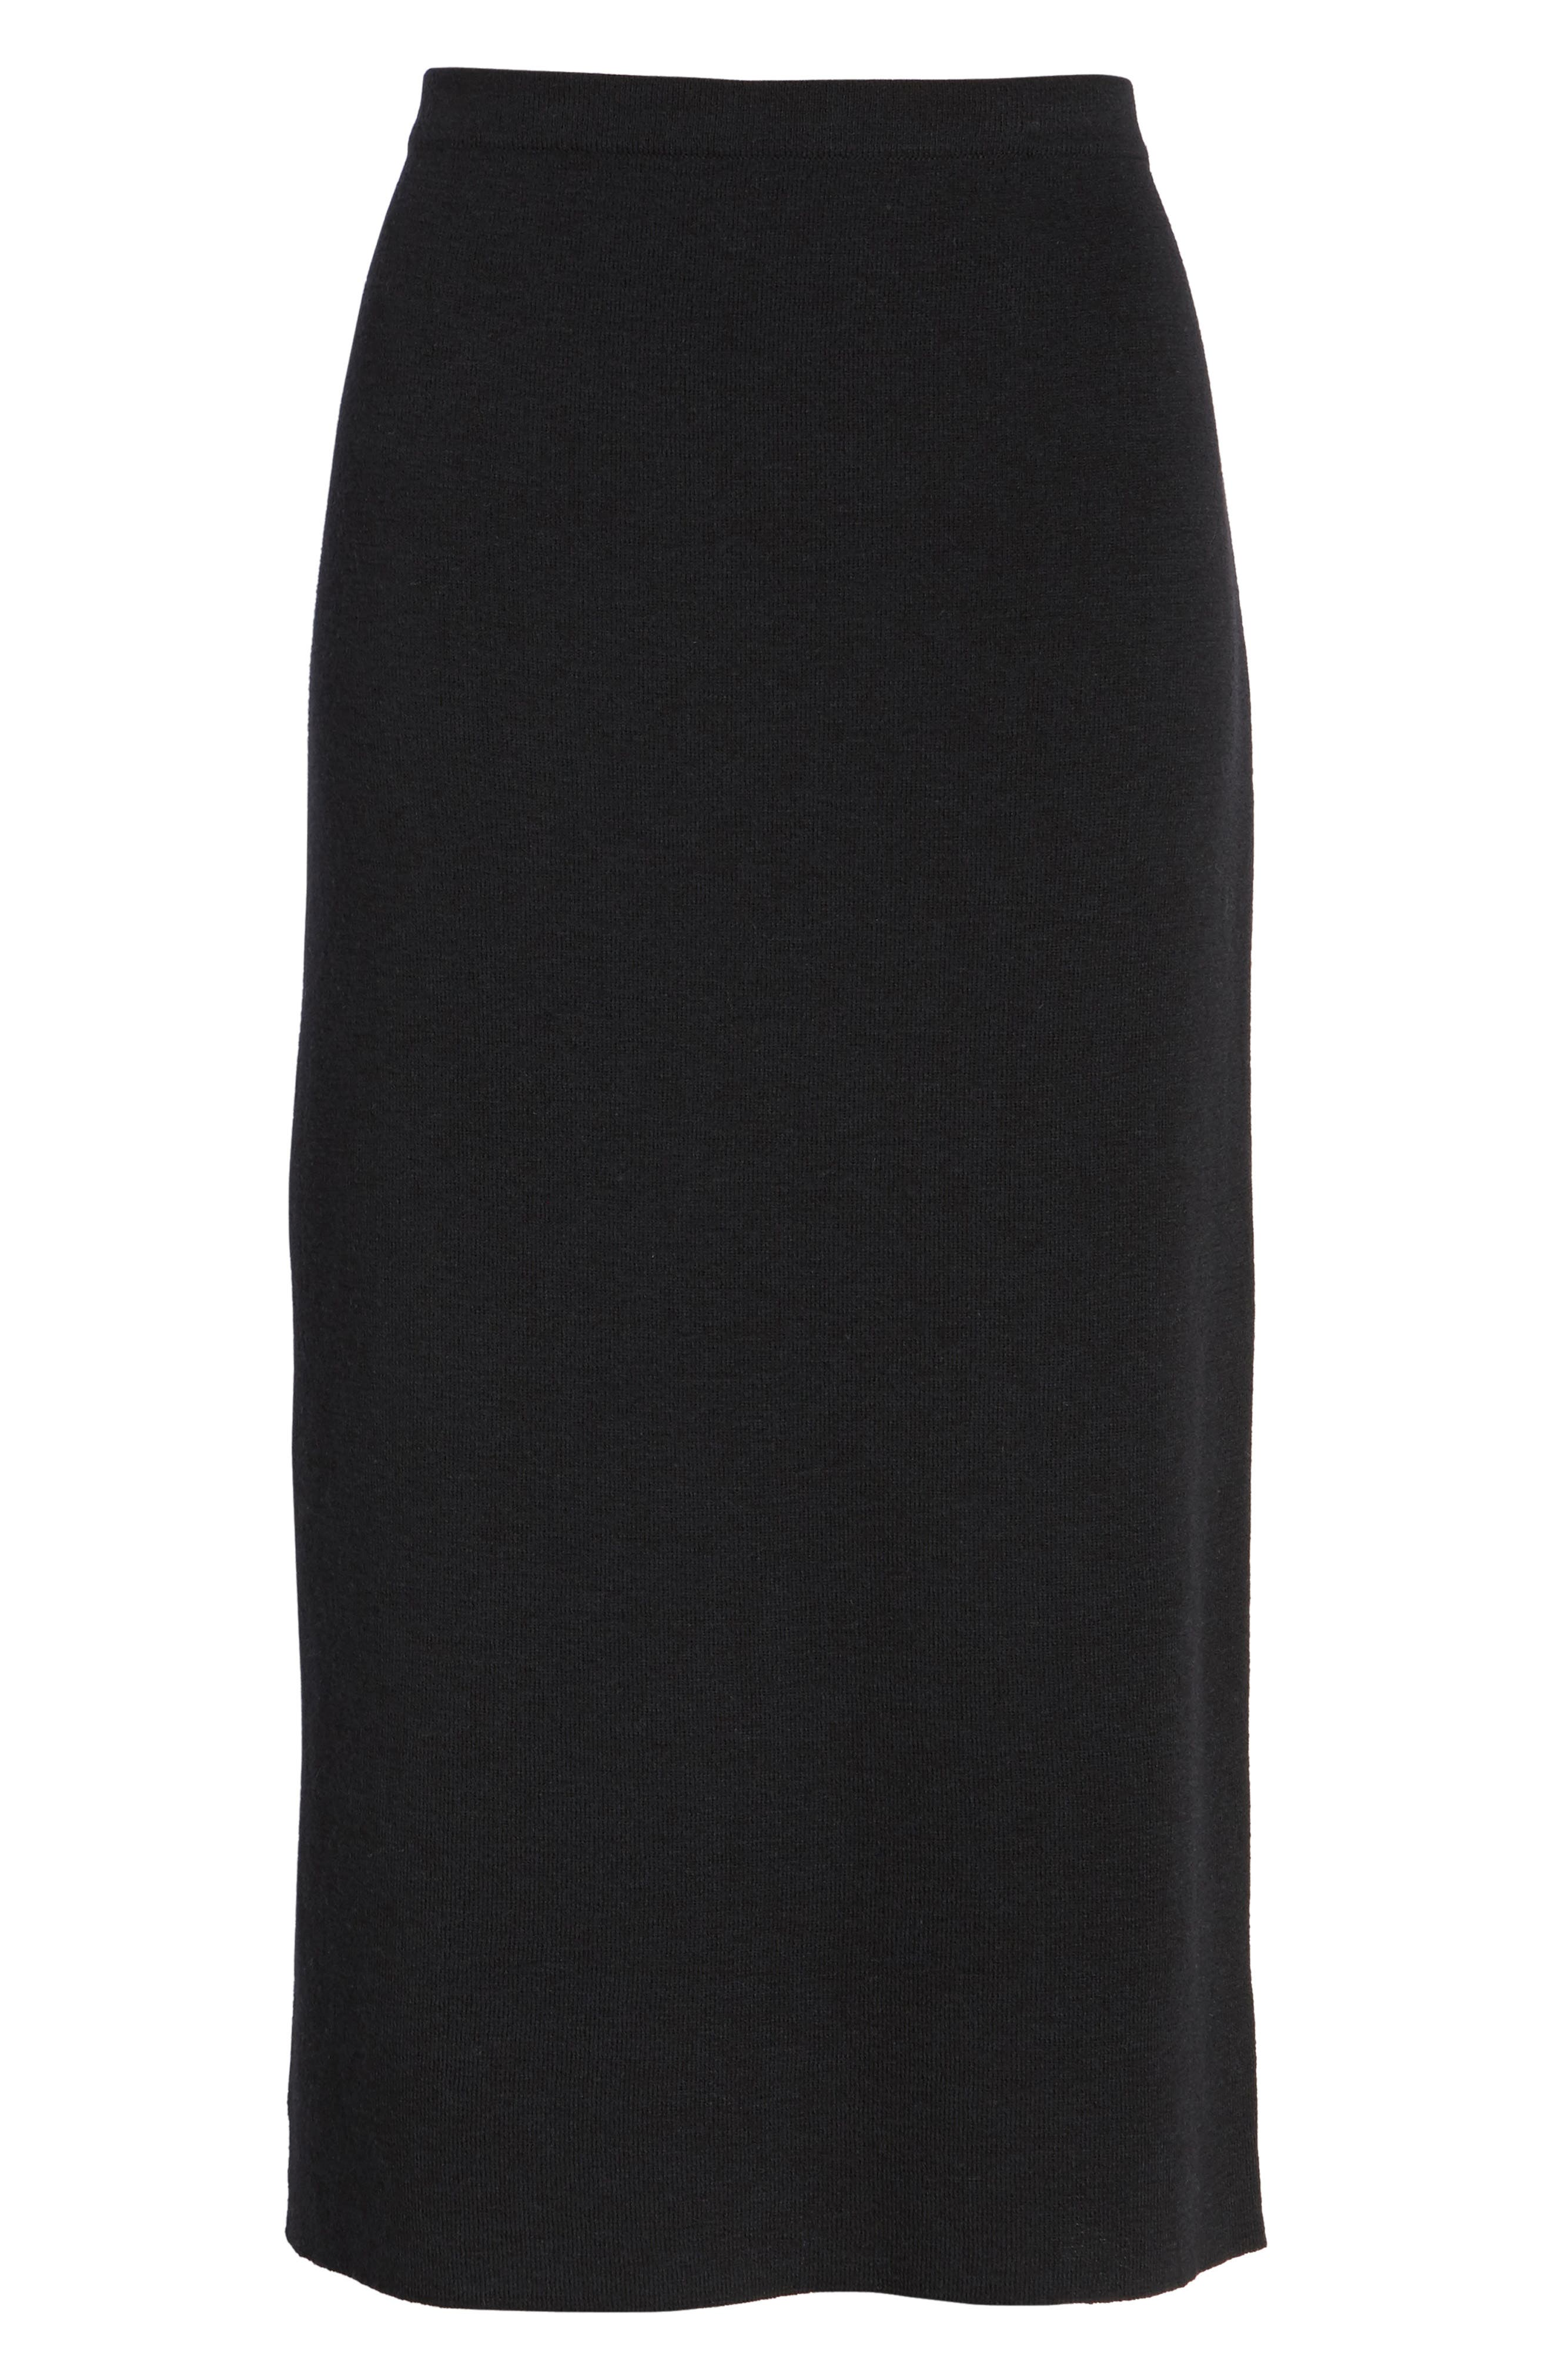 Wool Knit Pencil Skirt,                         Main,                         color, Black